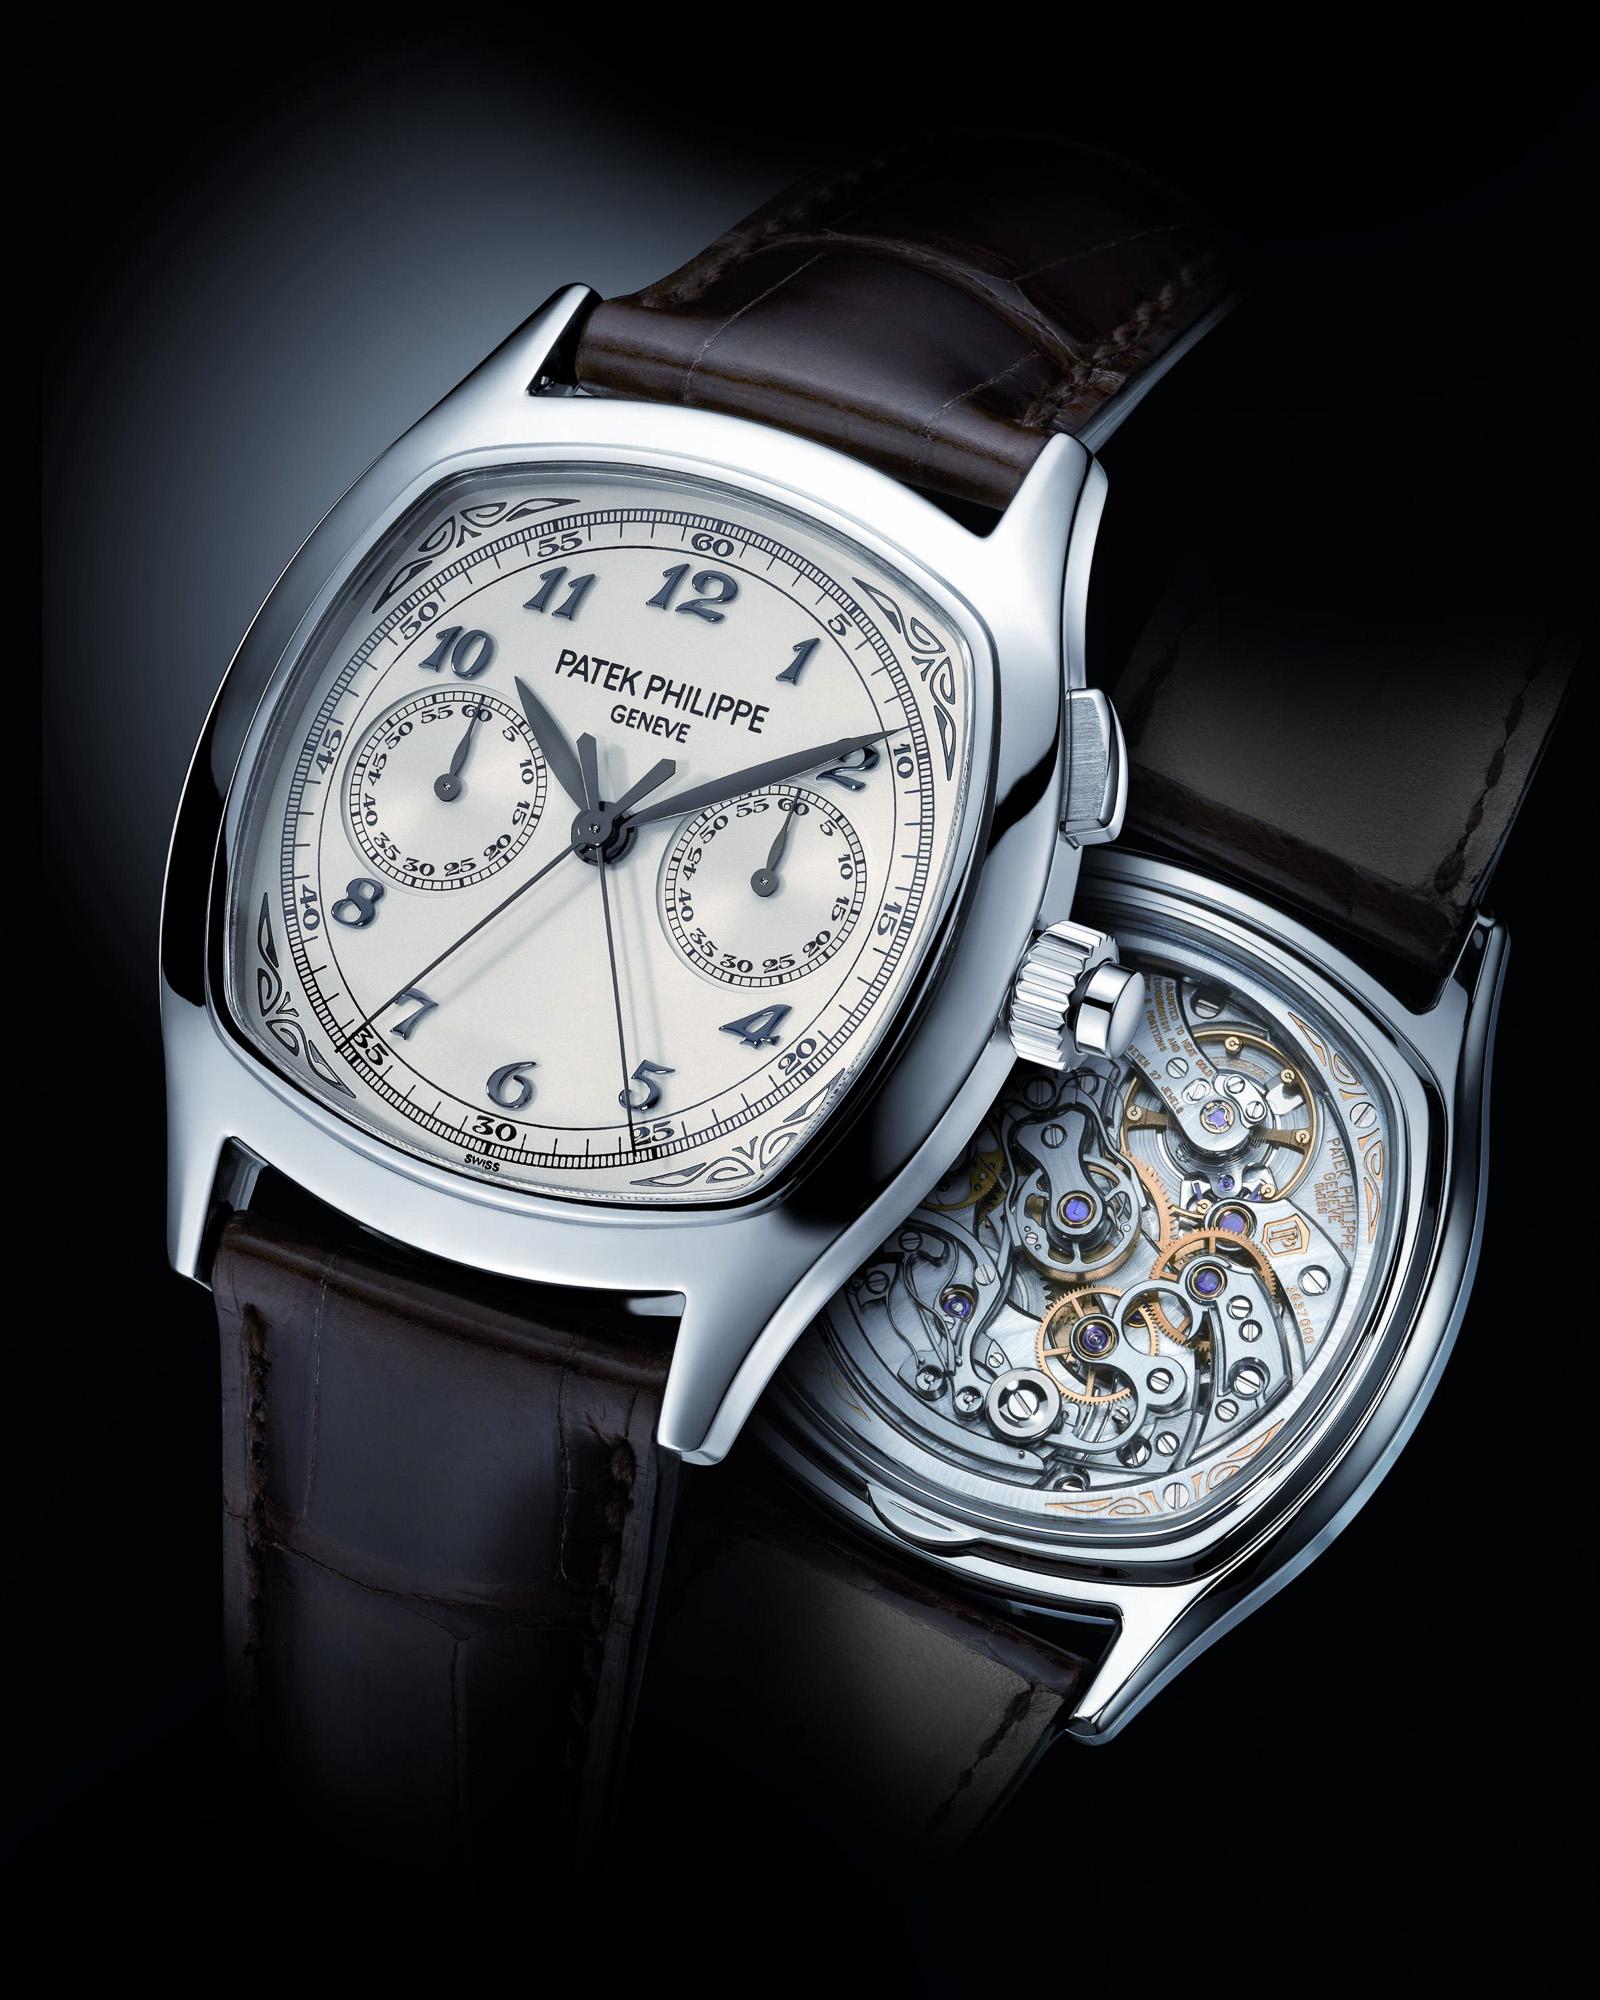 Patek Philippe Split seconds chronograph rattrapante 5950 monopusher